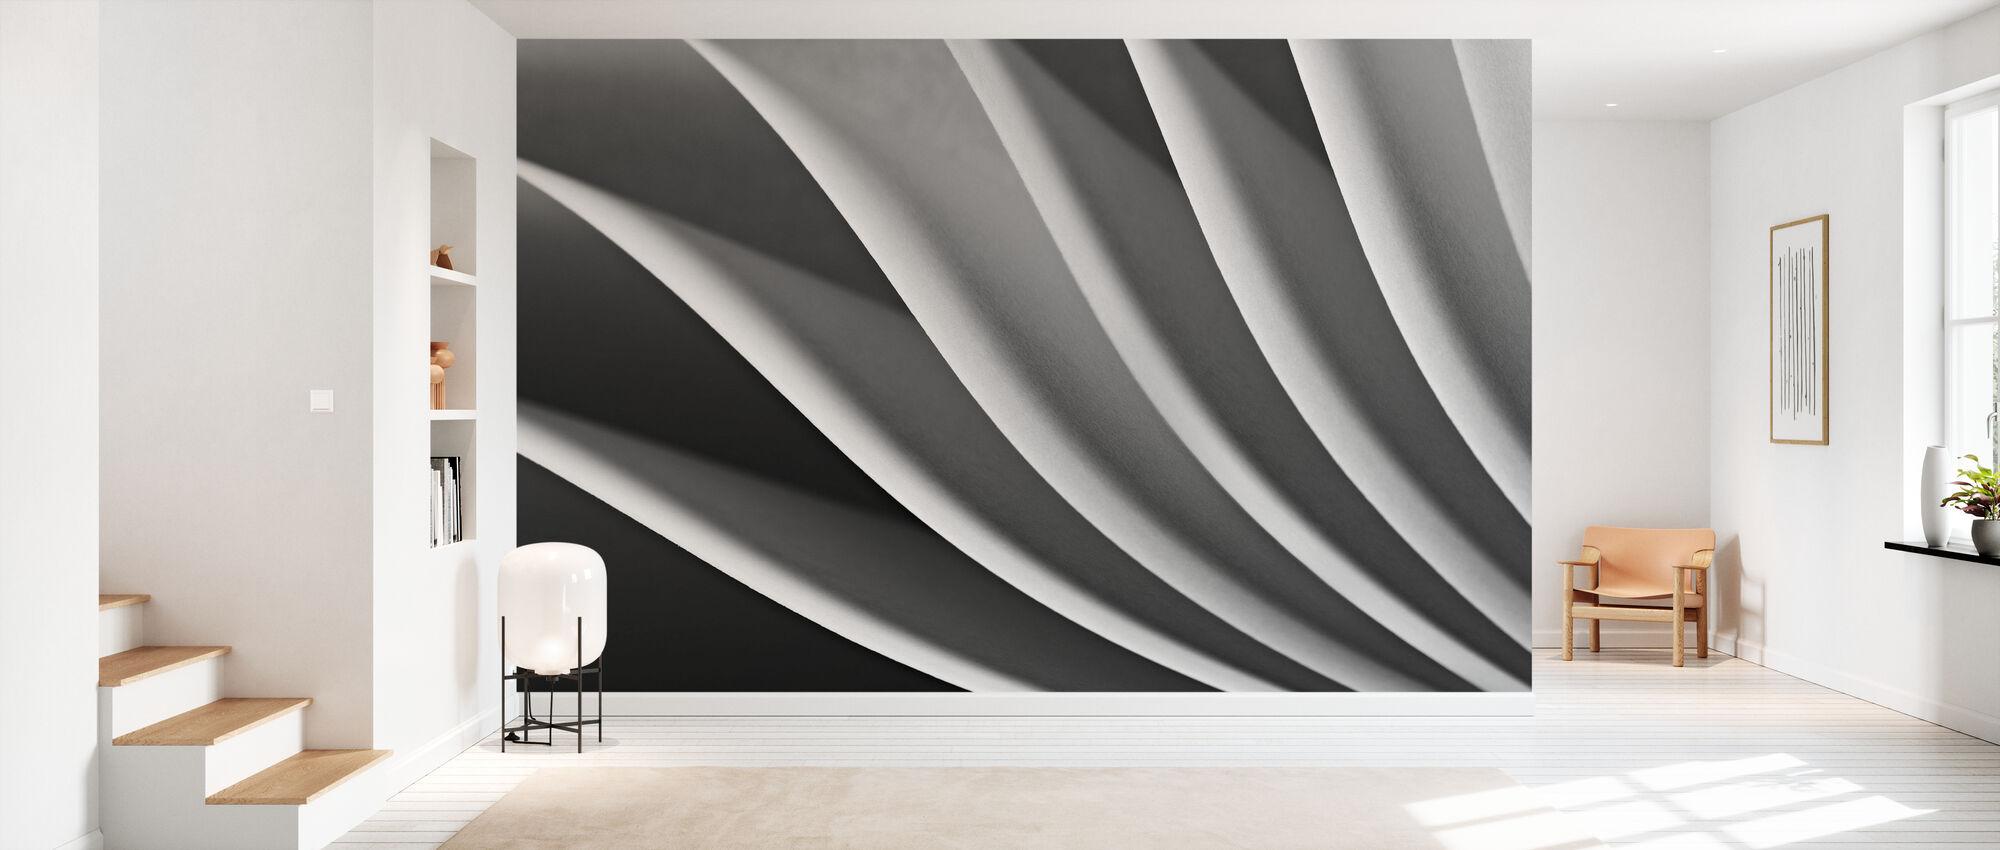 Paperi aalto - Tapetti - Aula